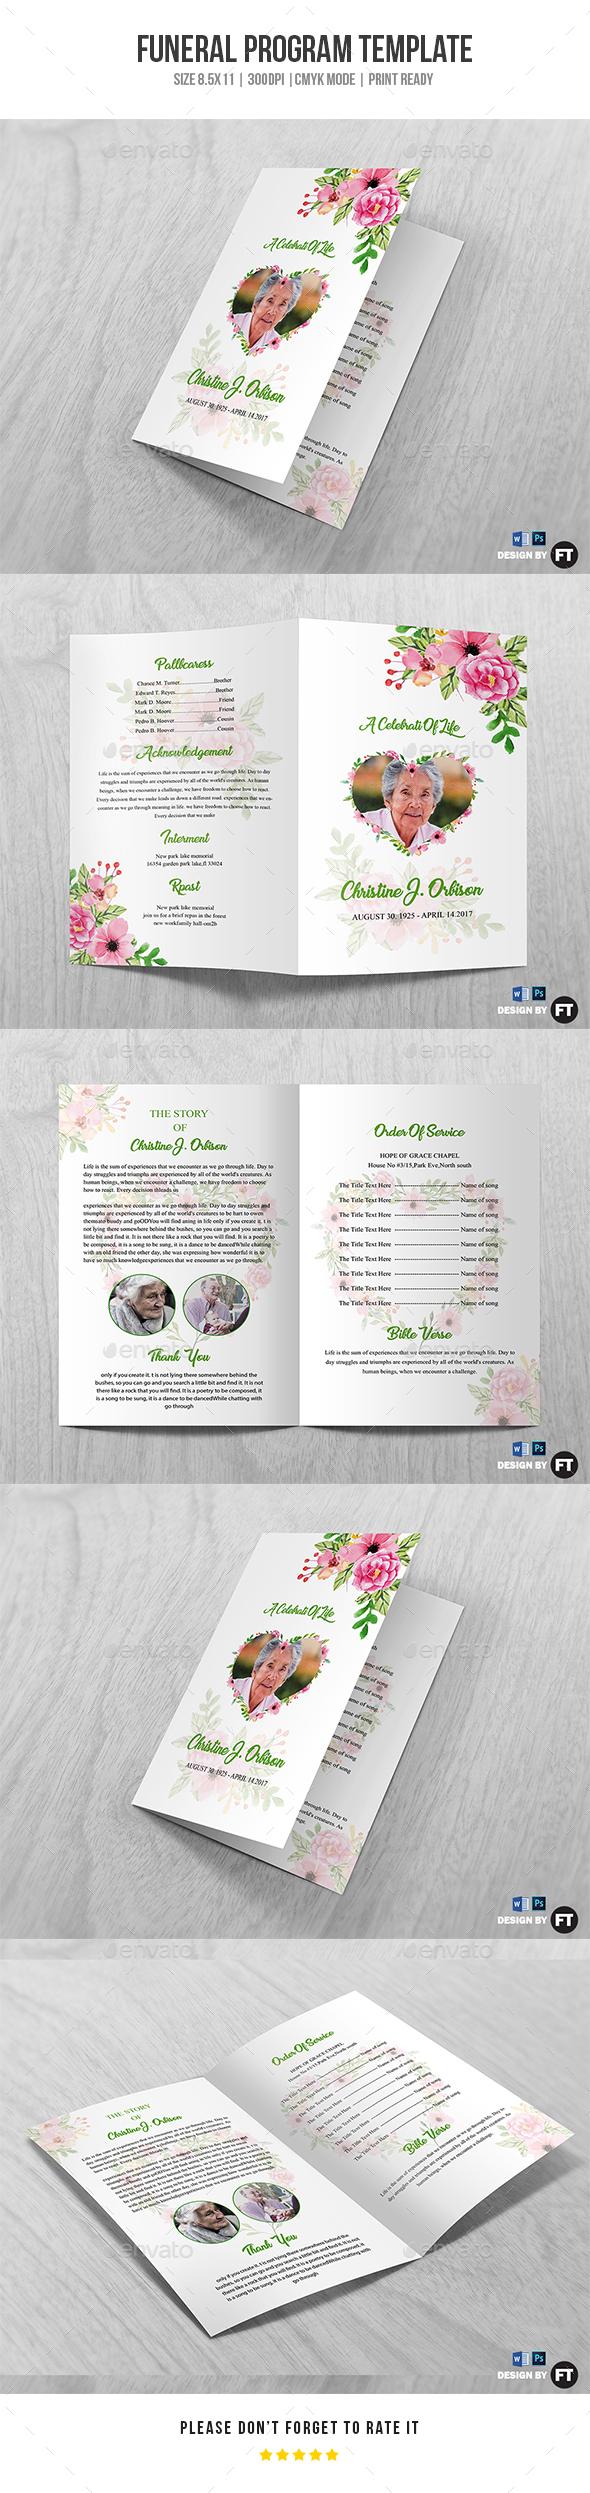 GraphicRiver Funeral Program Template Vol 34 20245566